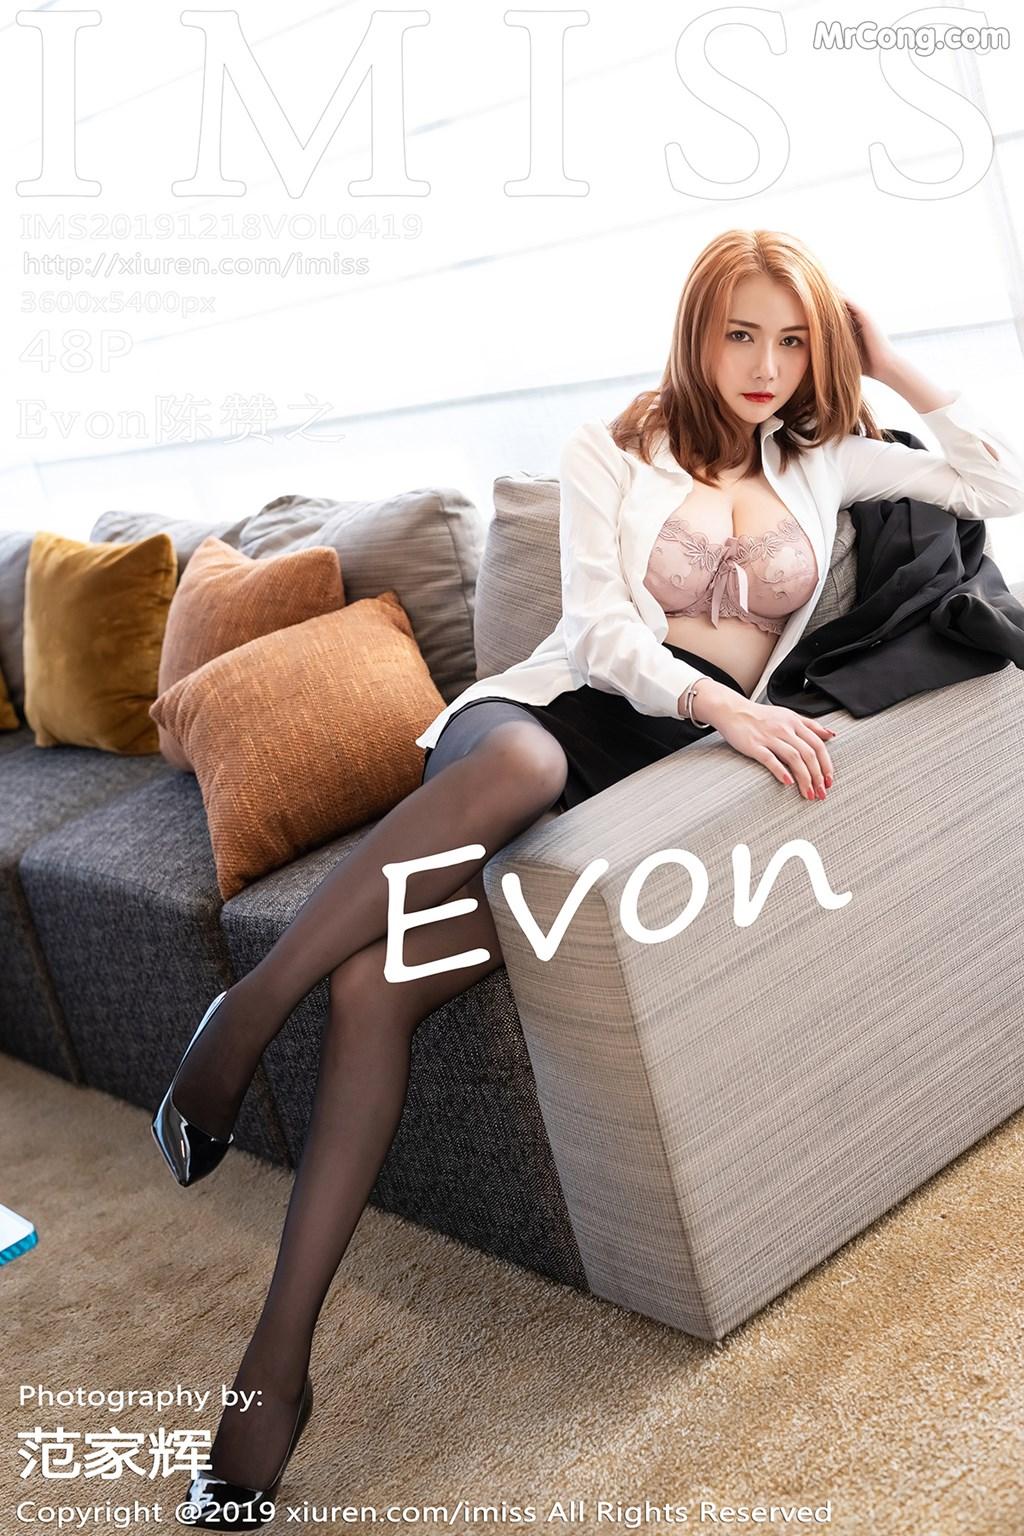 IMISS Vol.419: Evon 陈 赞 之 (49 photos)